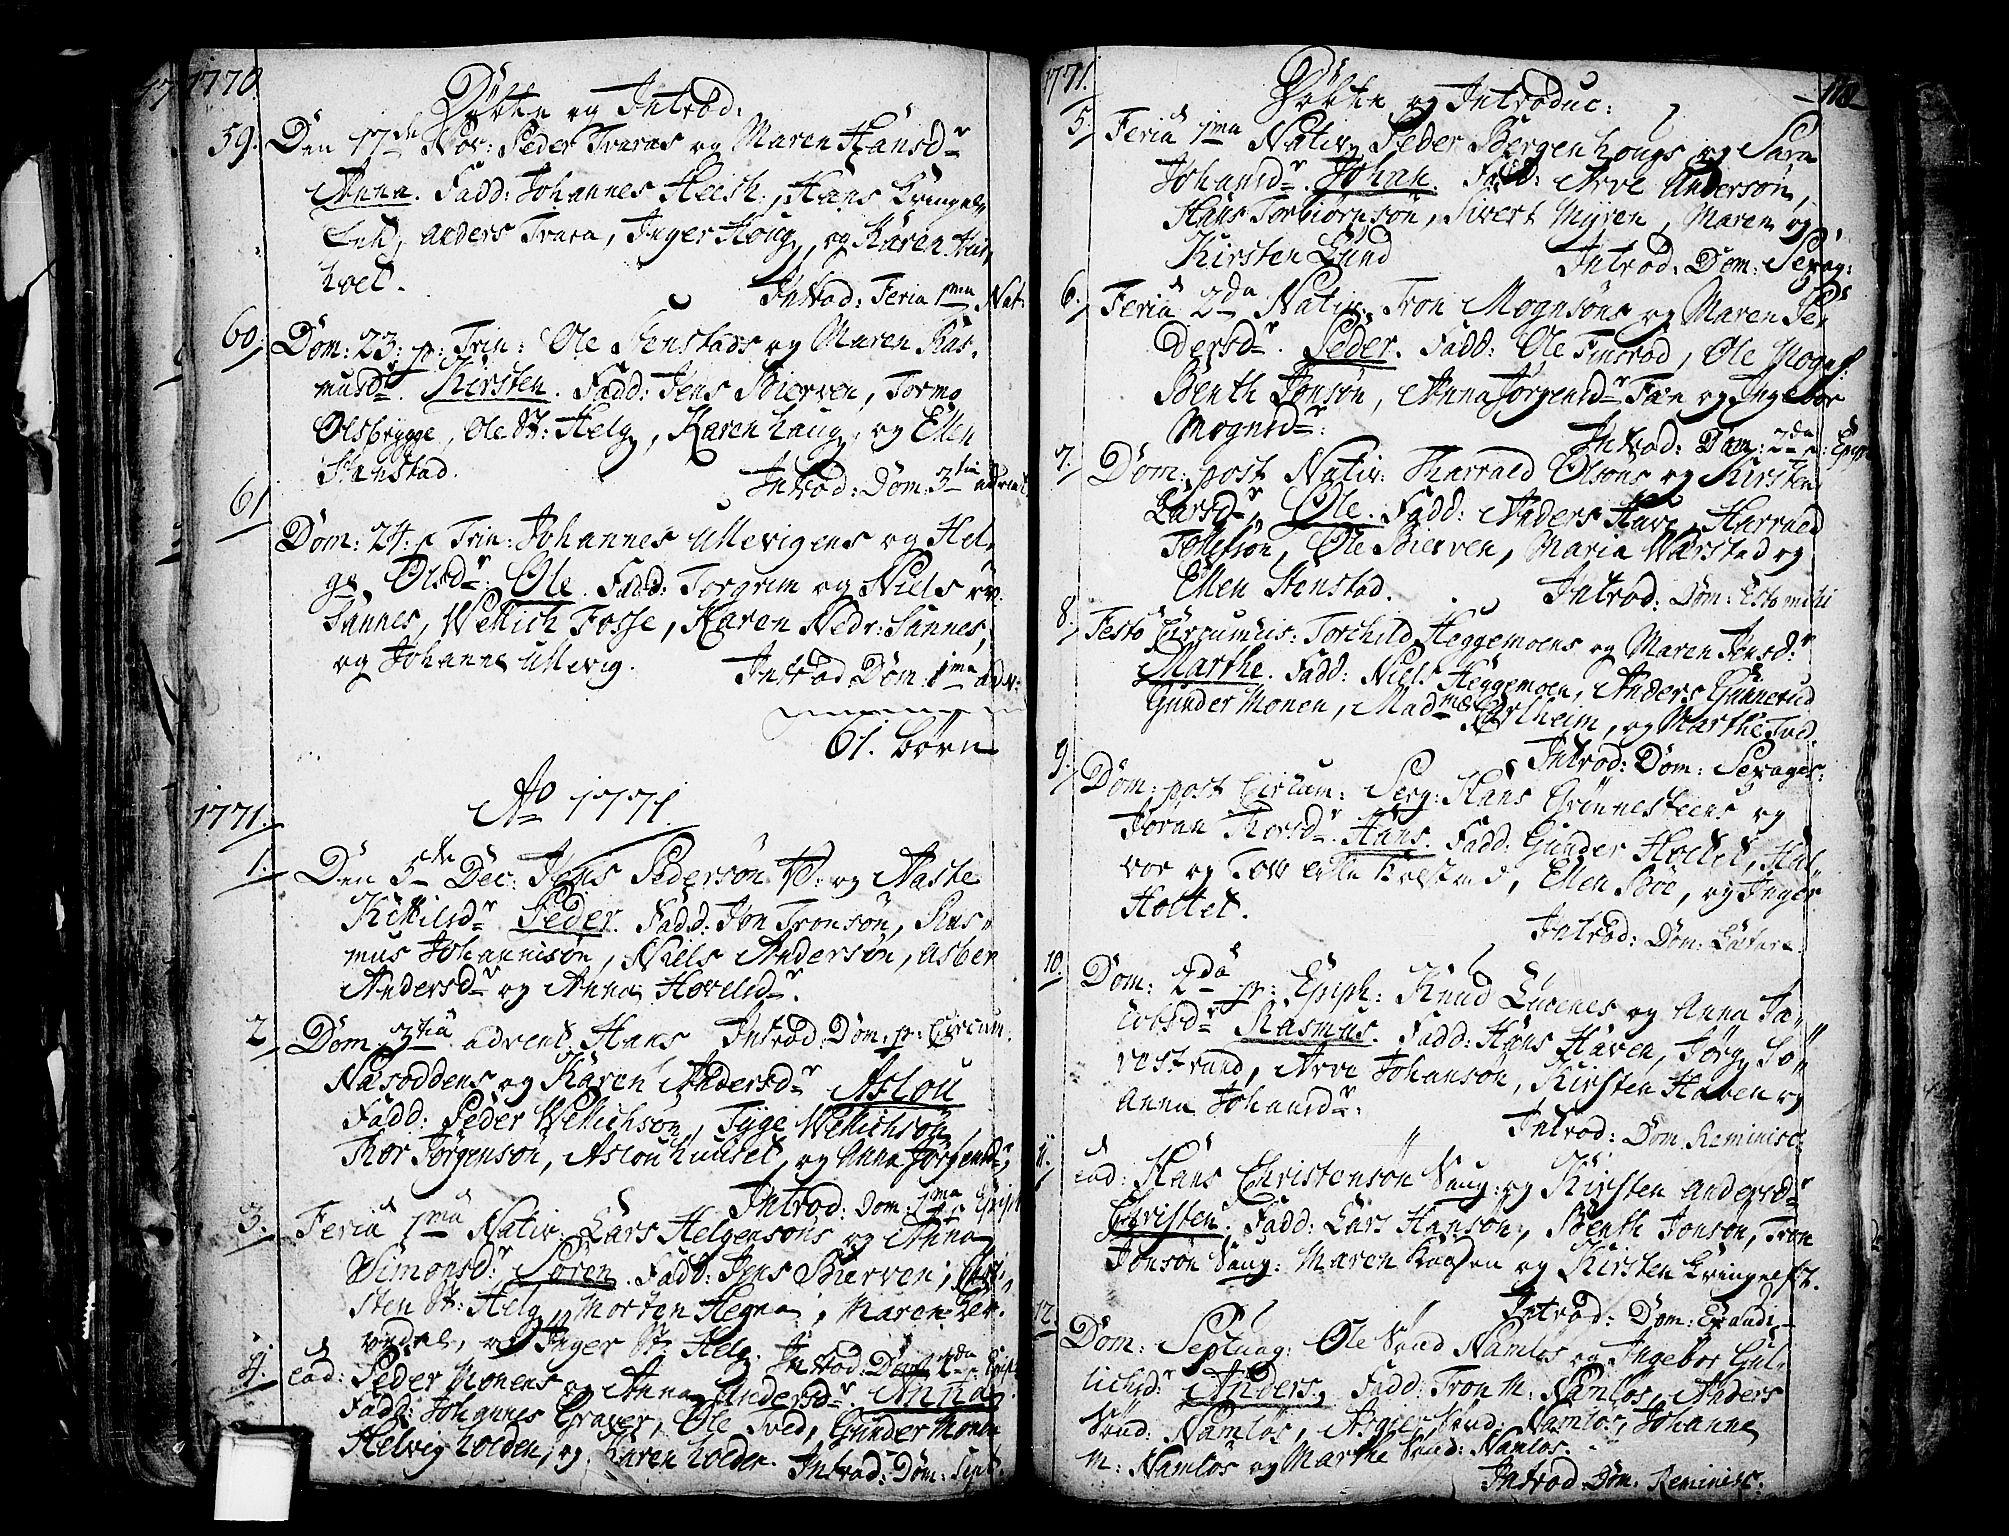 SAKO, Holla kirkebøker, F/Fa/L0001: Ministerialbok nr. 1, 1717-1779, s. 118